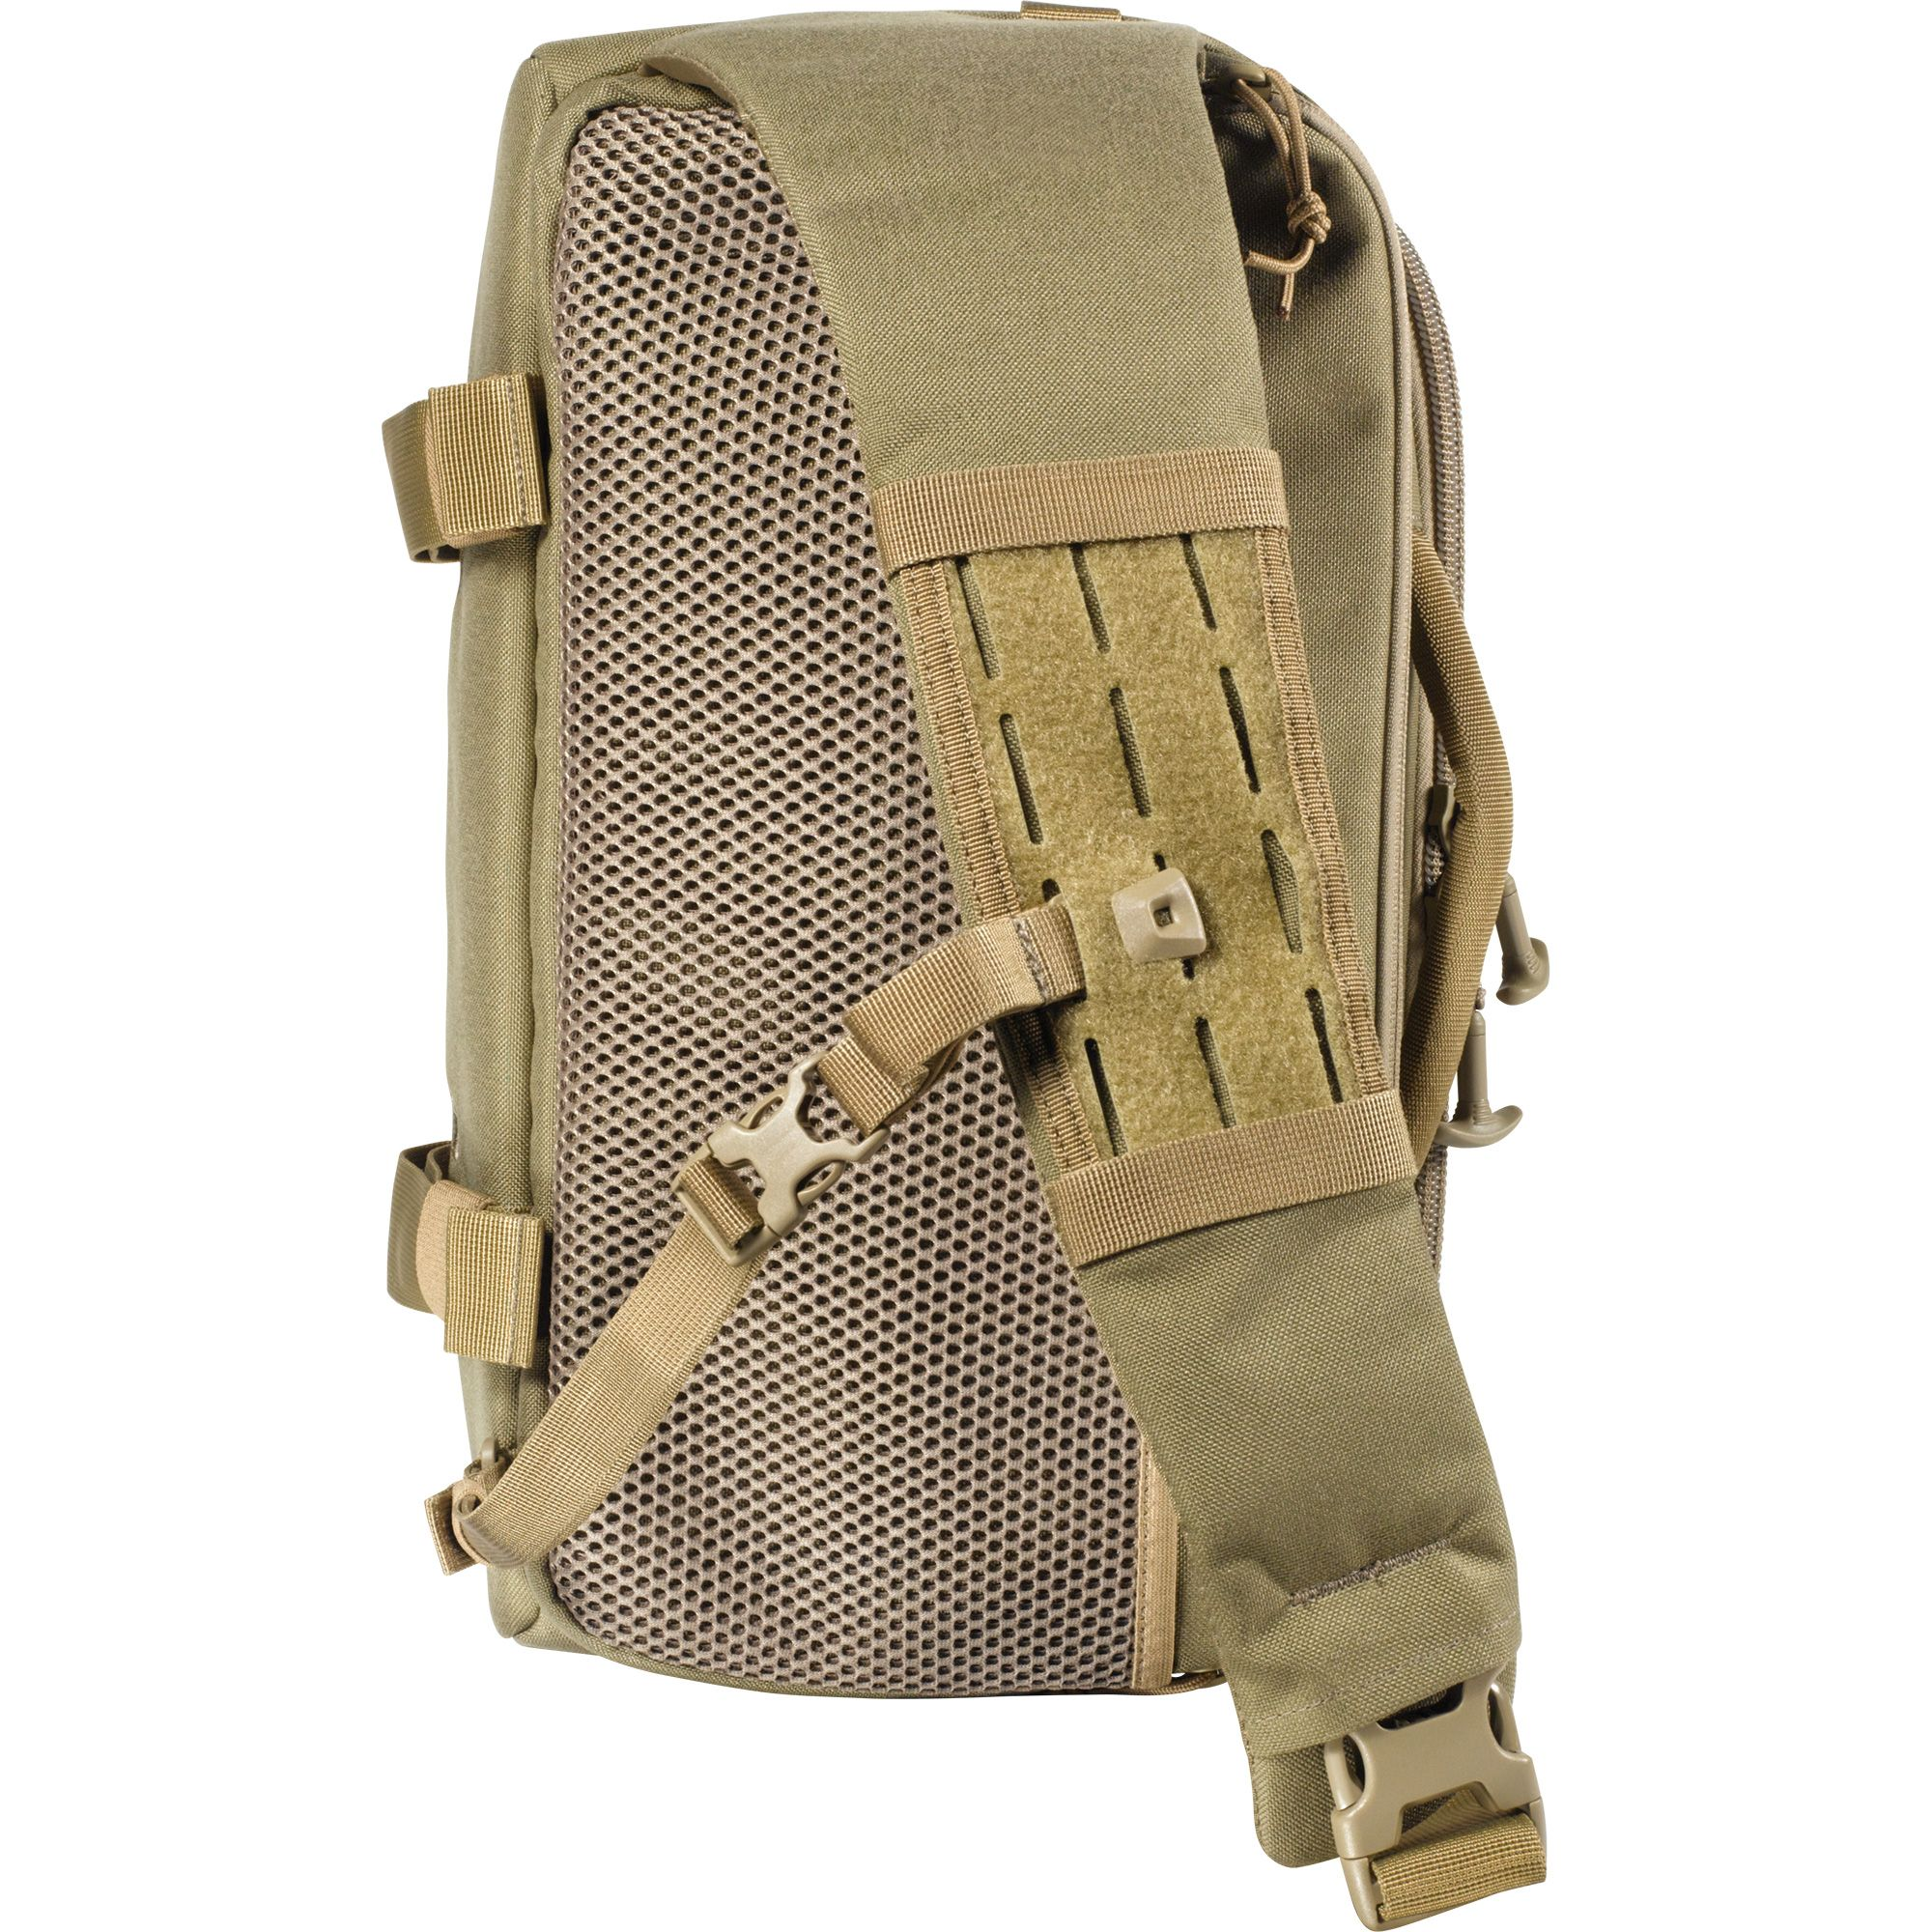 Balo 1 Quai 5.11 Tactical UCR SLing – Sandstone